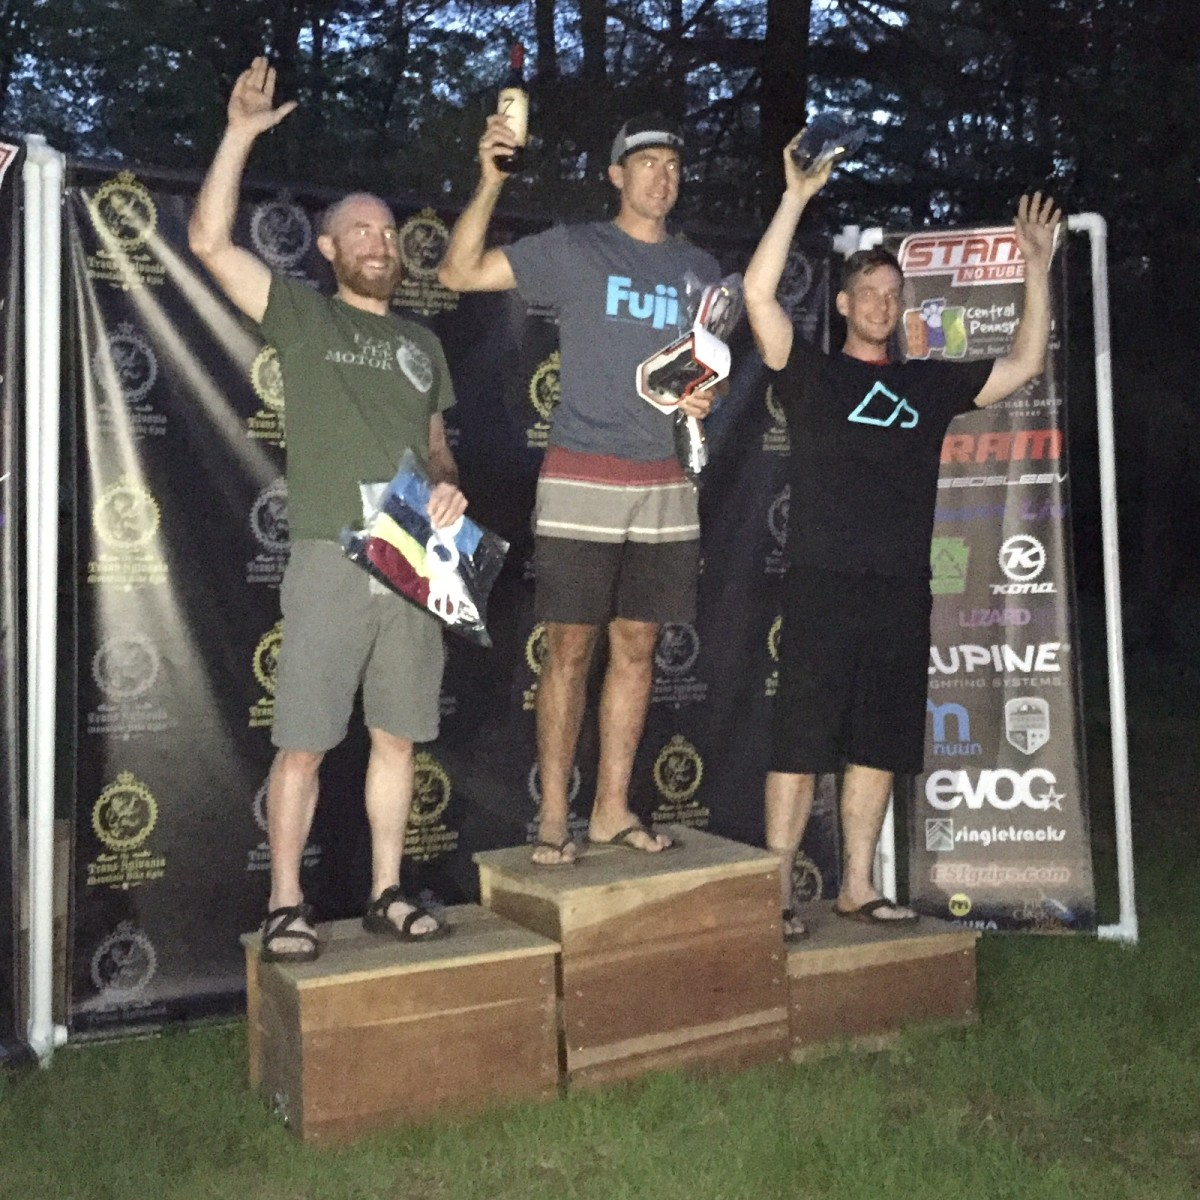 Made the podium!